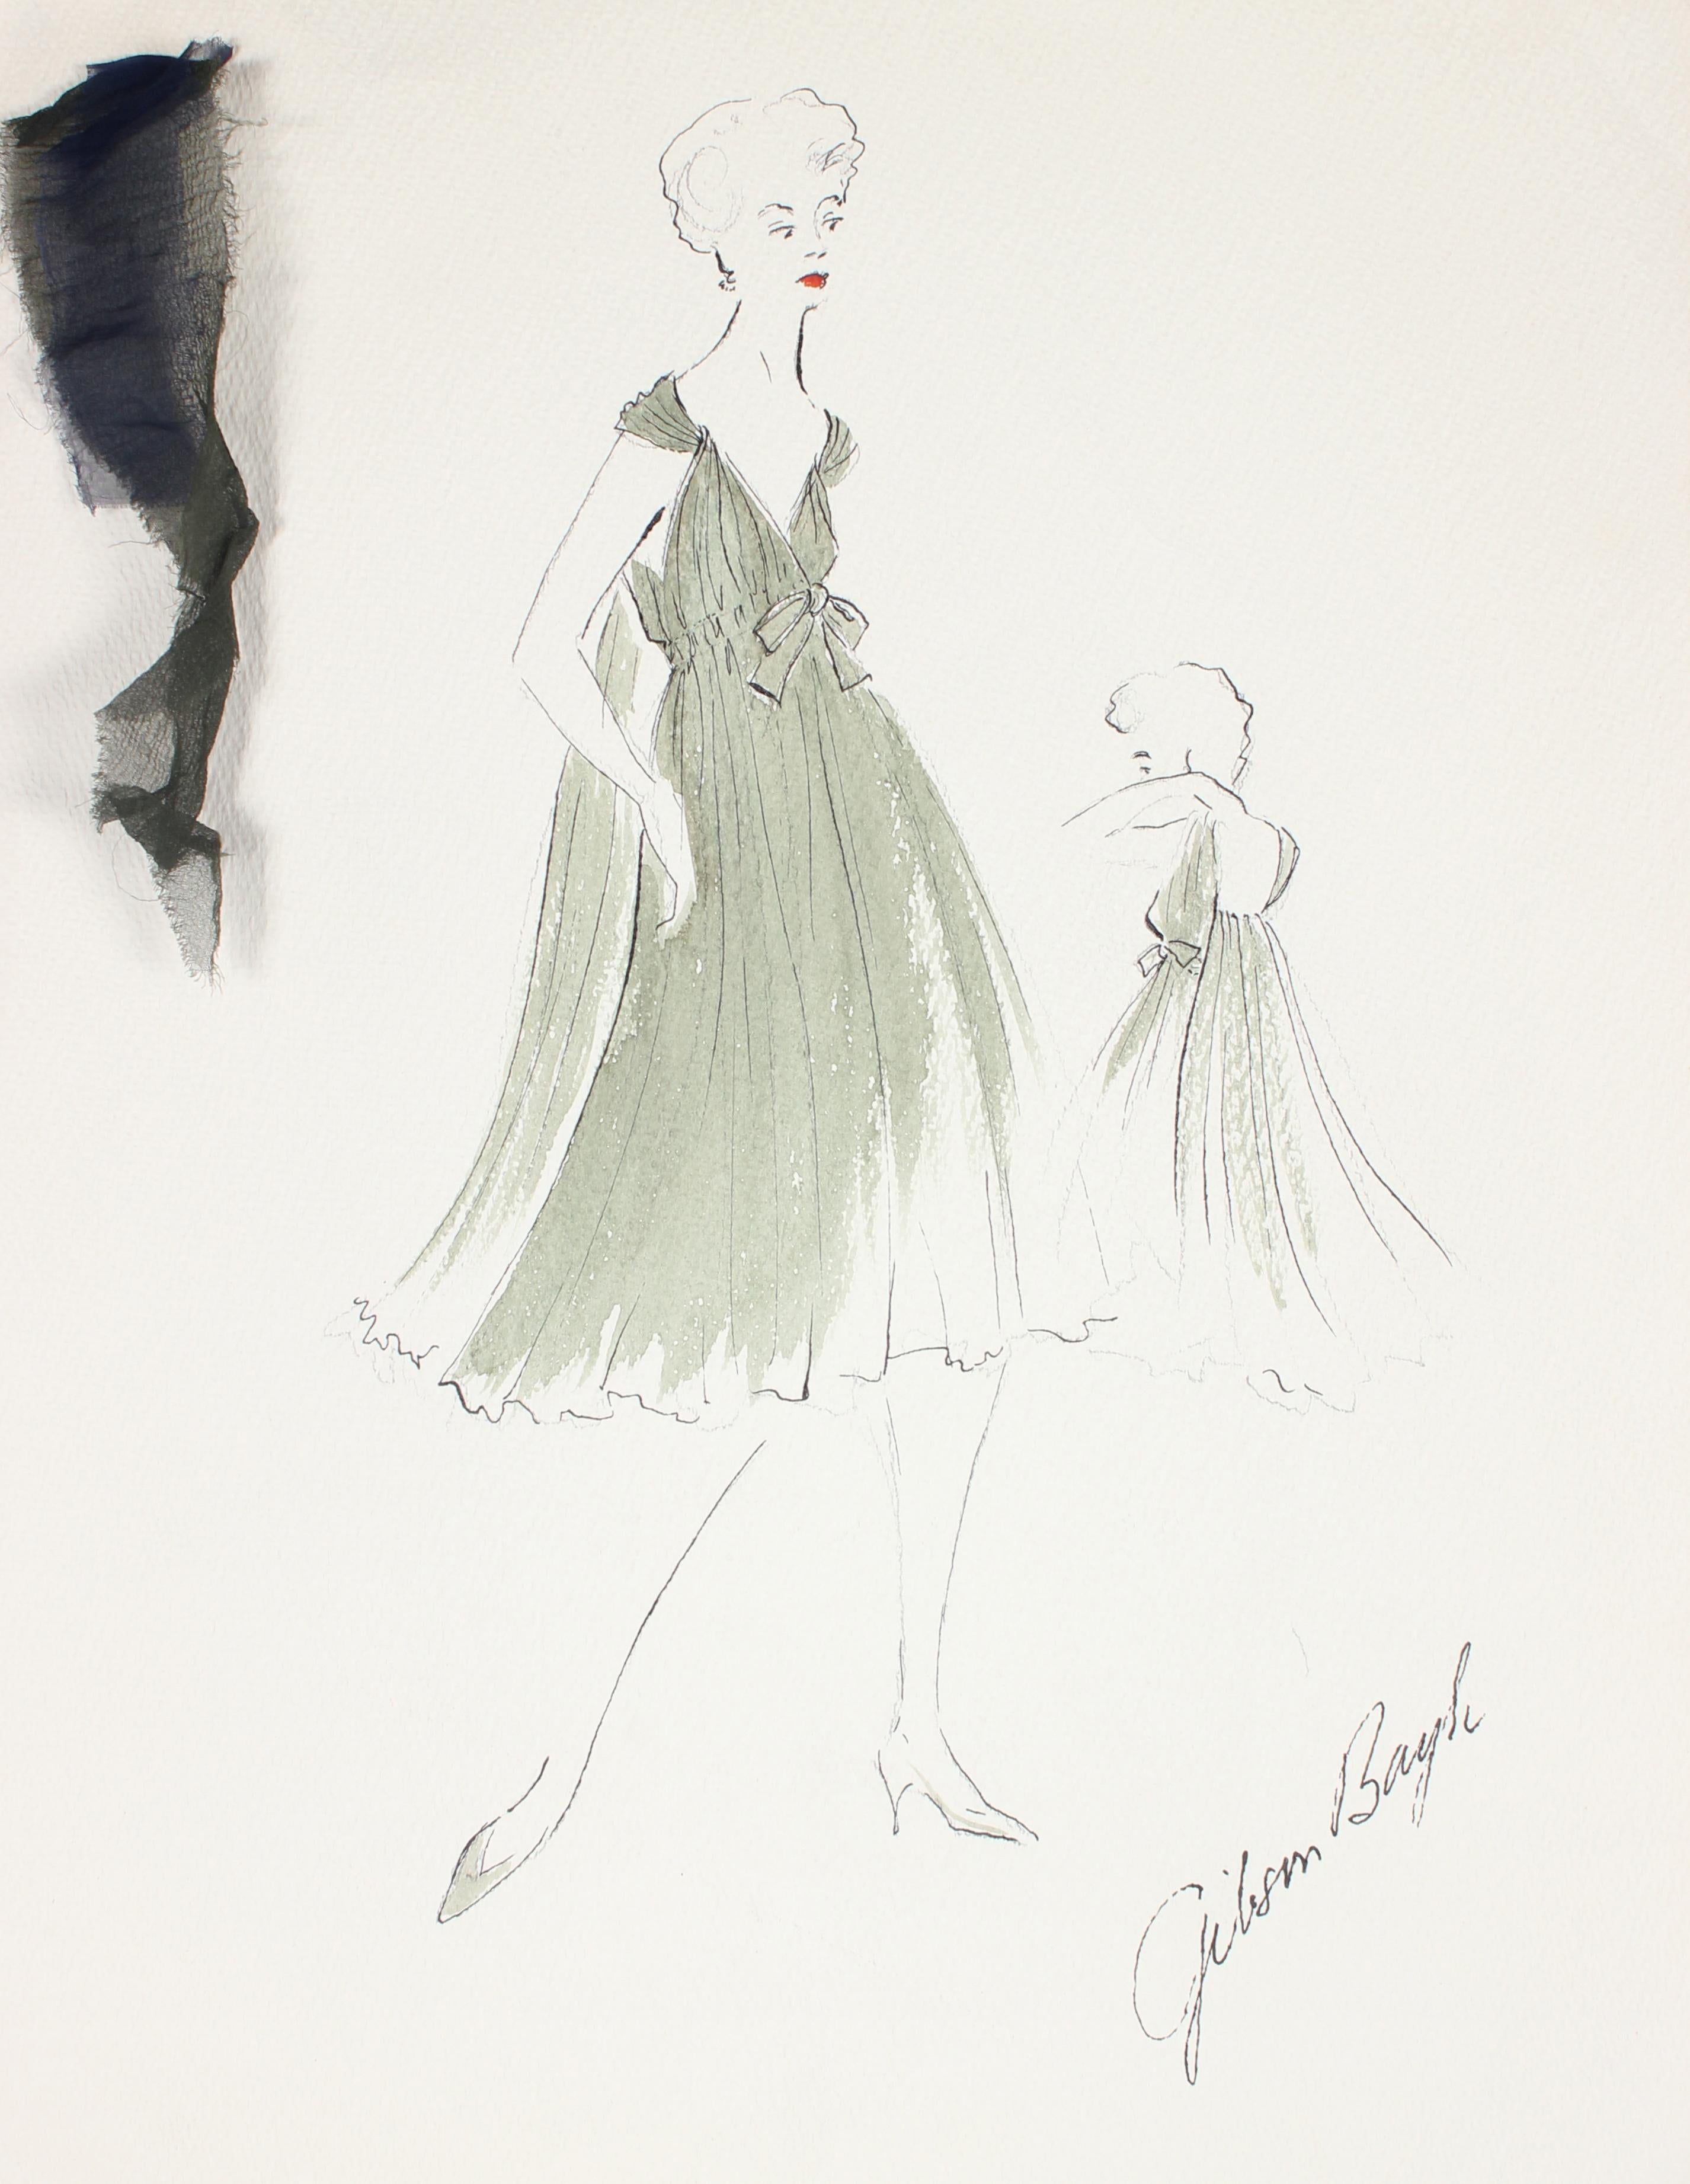 Flowy Olive Green Dress Gouache & Ink 1950's Fashion Illustration